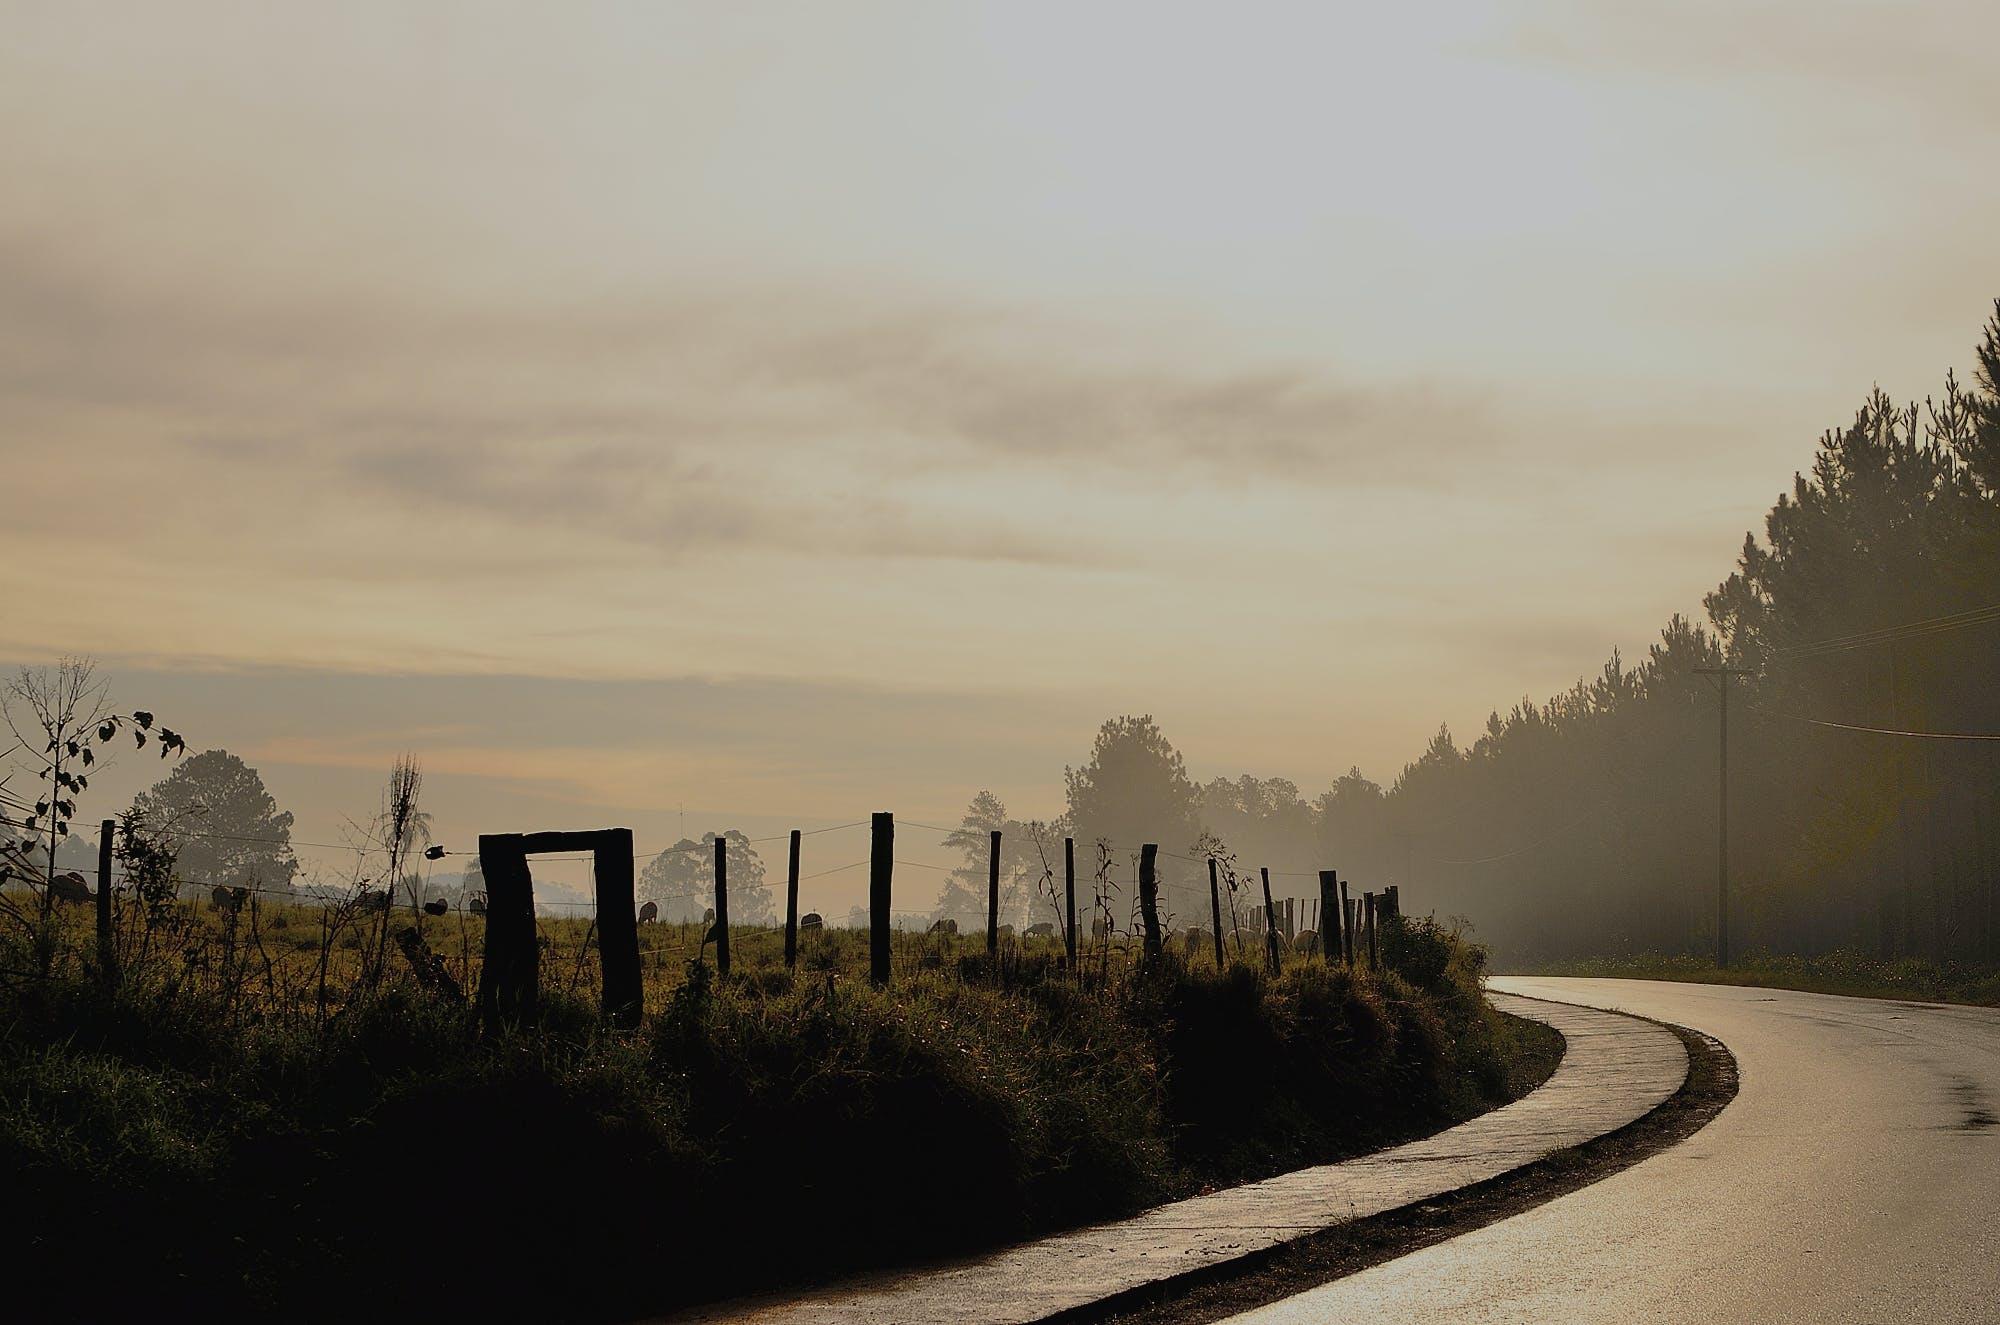 Black Curve Asphalt Road Beside Green Field